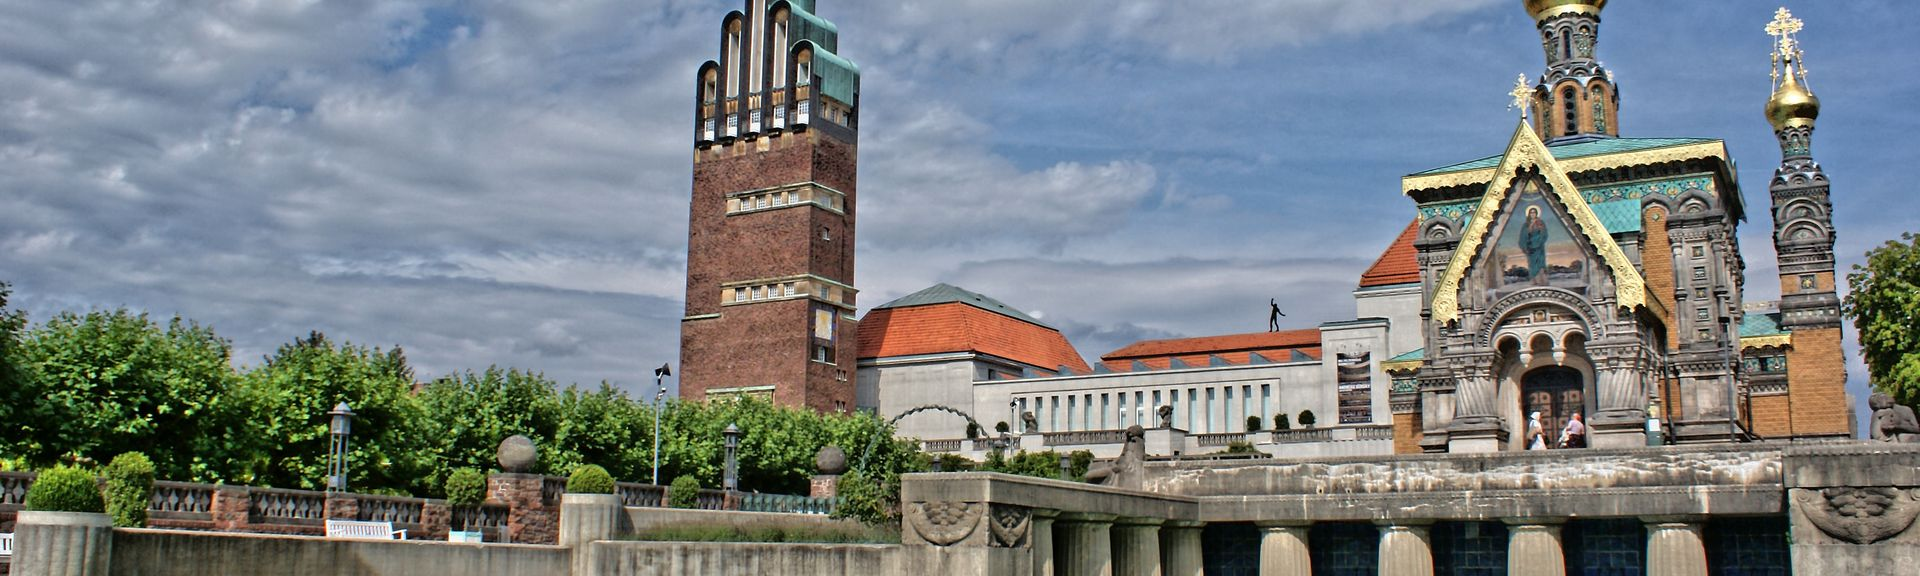 Mömlingen, Germany